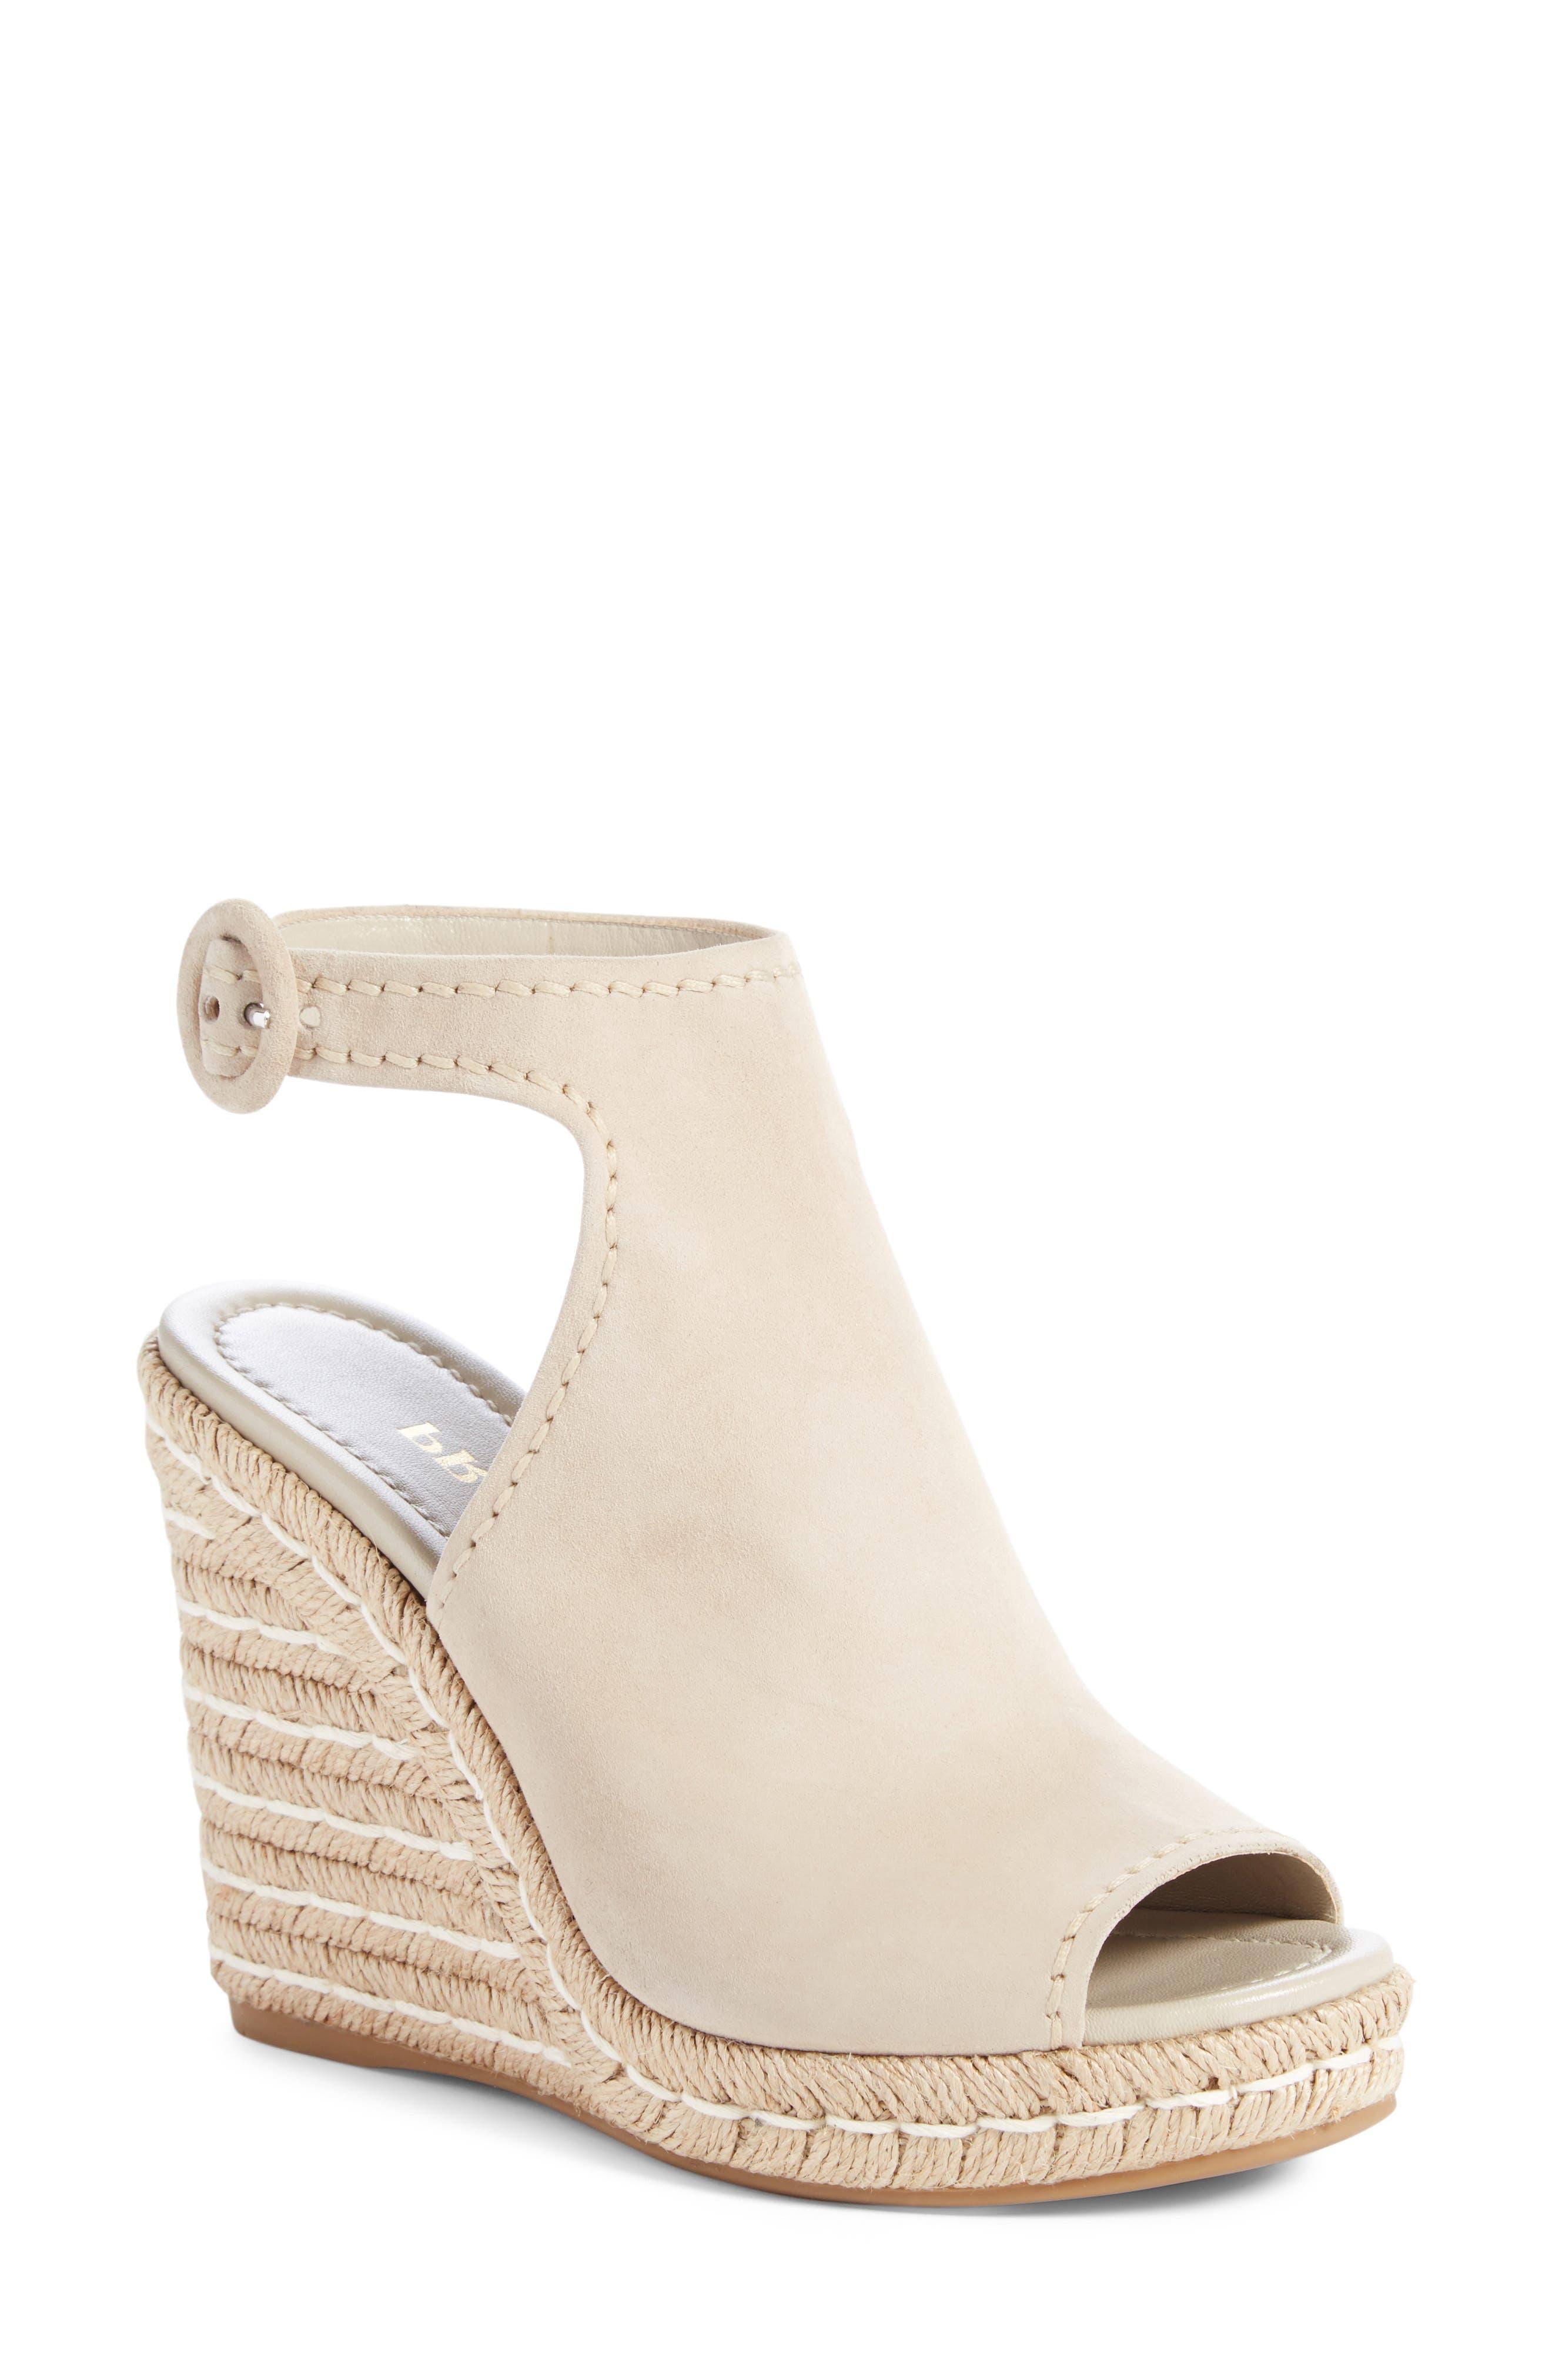 Ankle Strap Espadrille Wedge Sandal,                             Main thumbnail 1, color,                             Beige